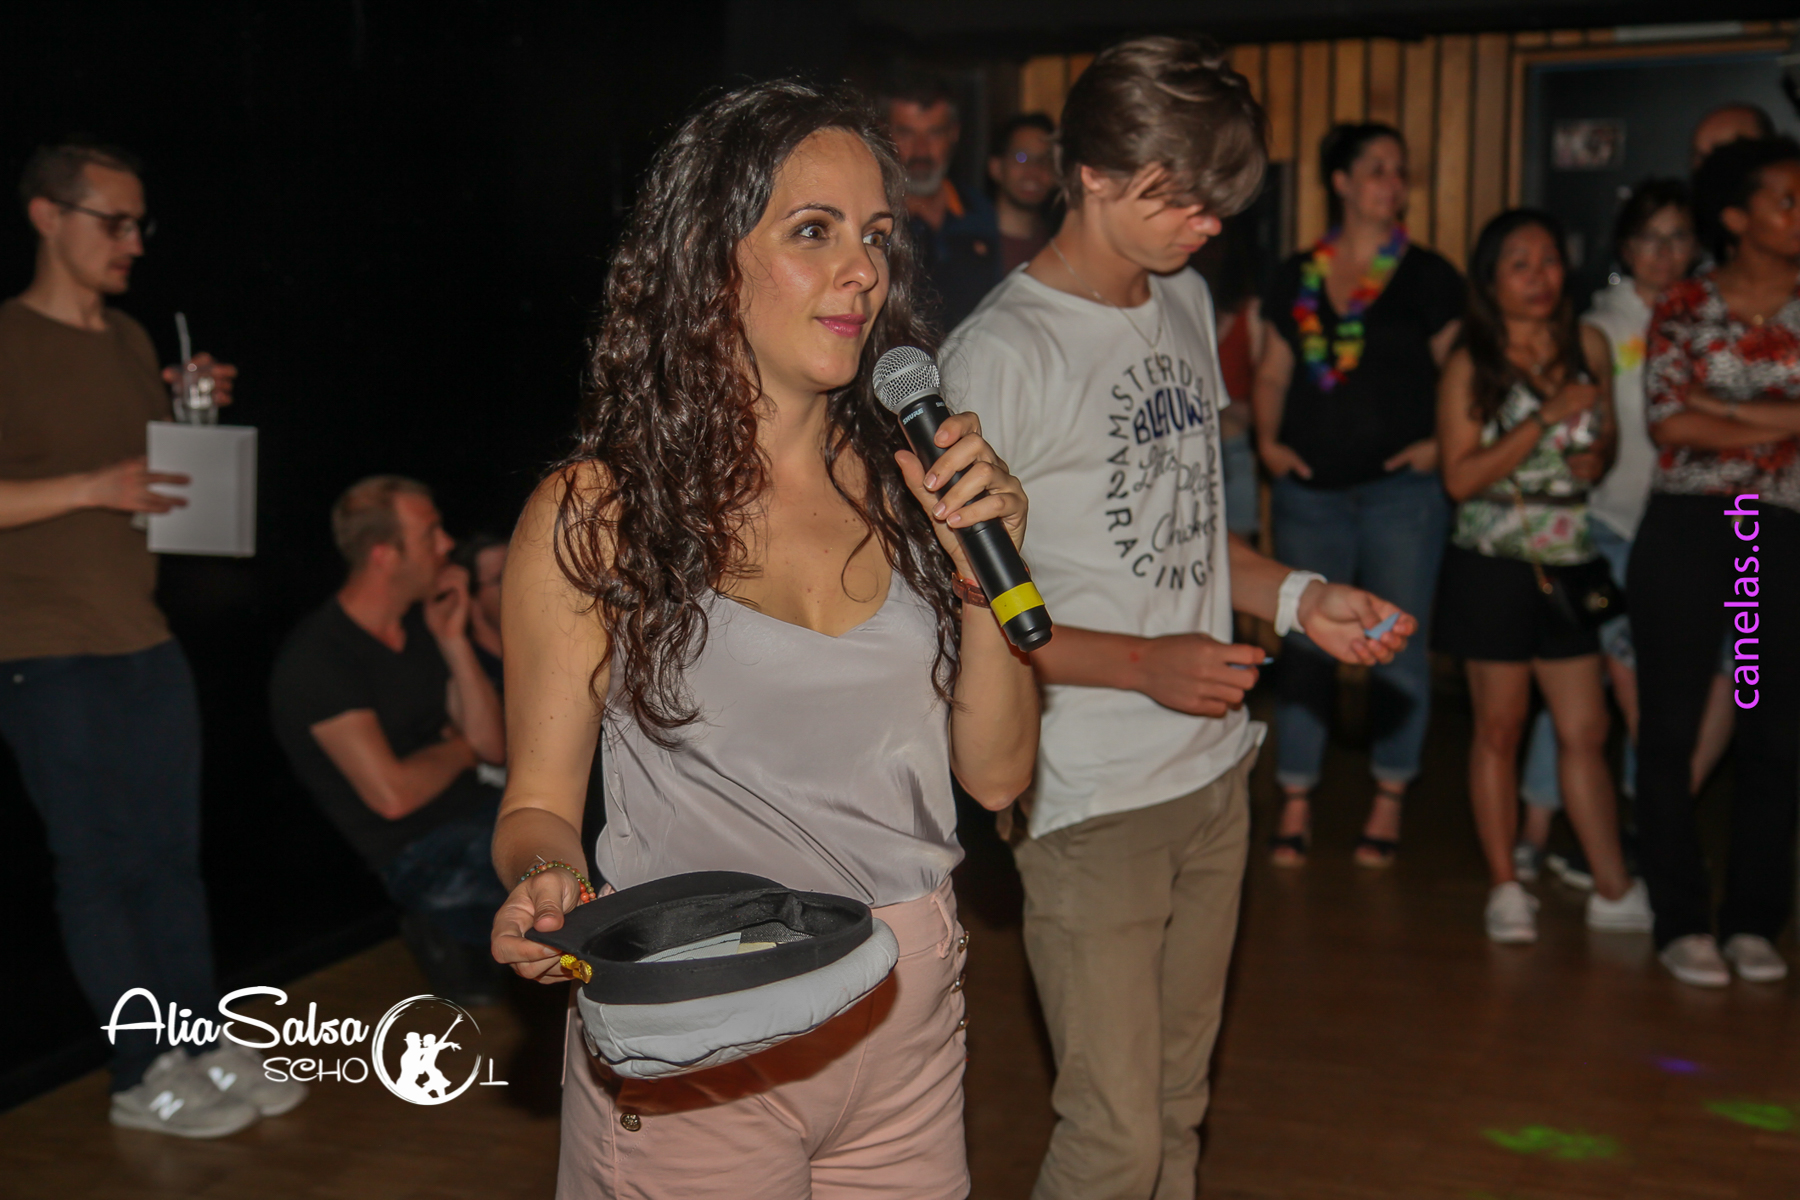 AliaSalsa ecole de danse lausanne soiree bachata salsa cubaineAlia Salsa Soireé Salsa - Bachata-22